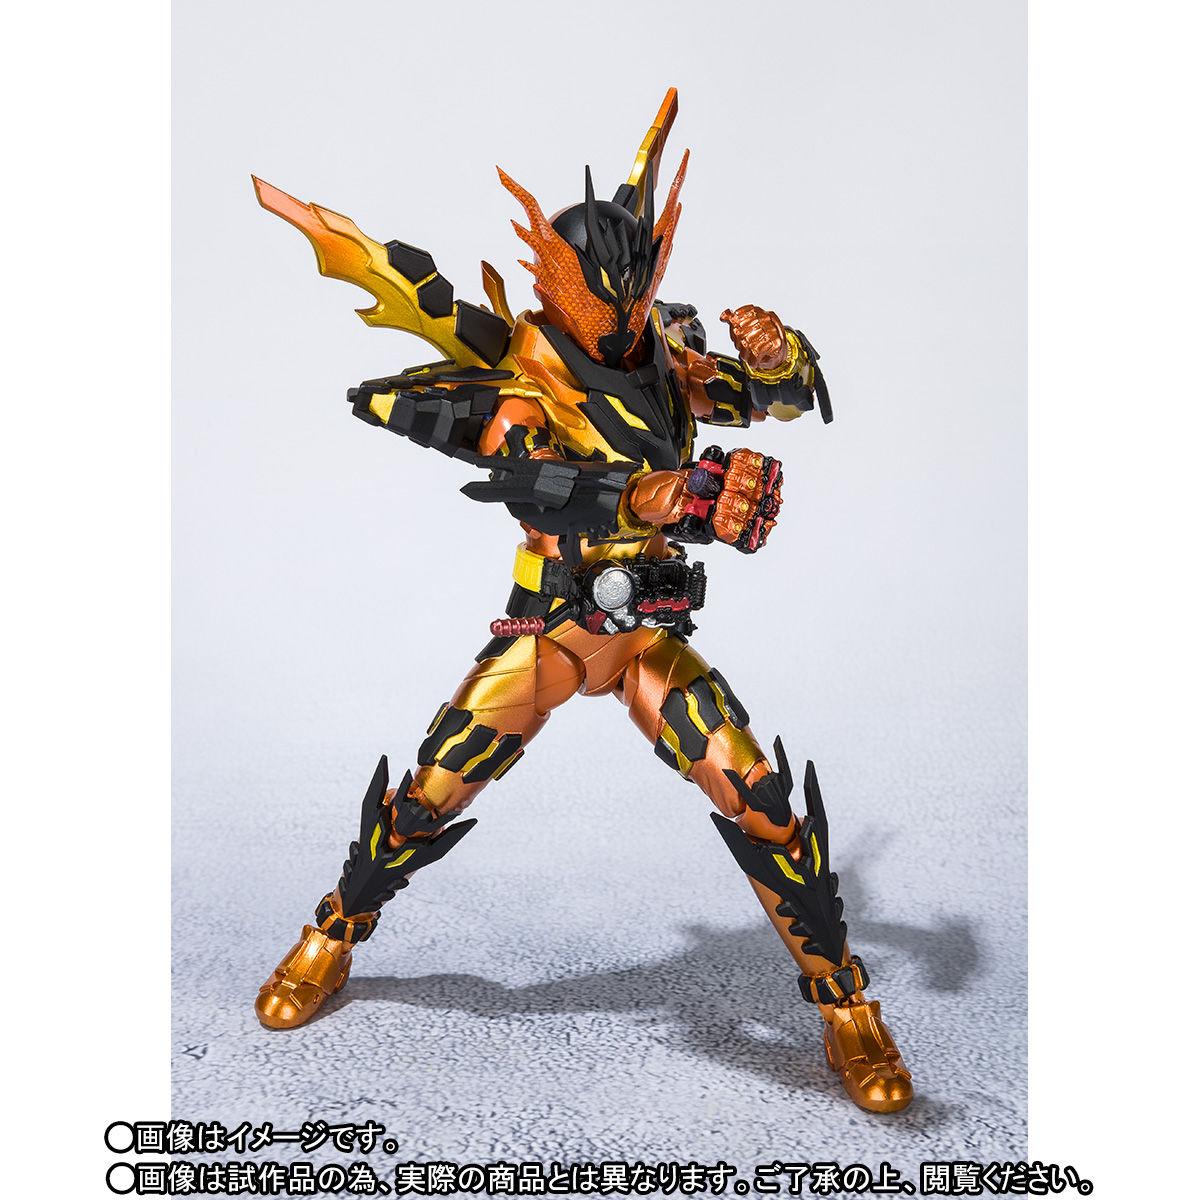 S.H.フィギュアーツ『仮面ライダー クローズマグマ』可動フィギュア-002